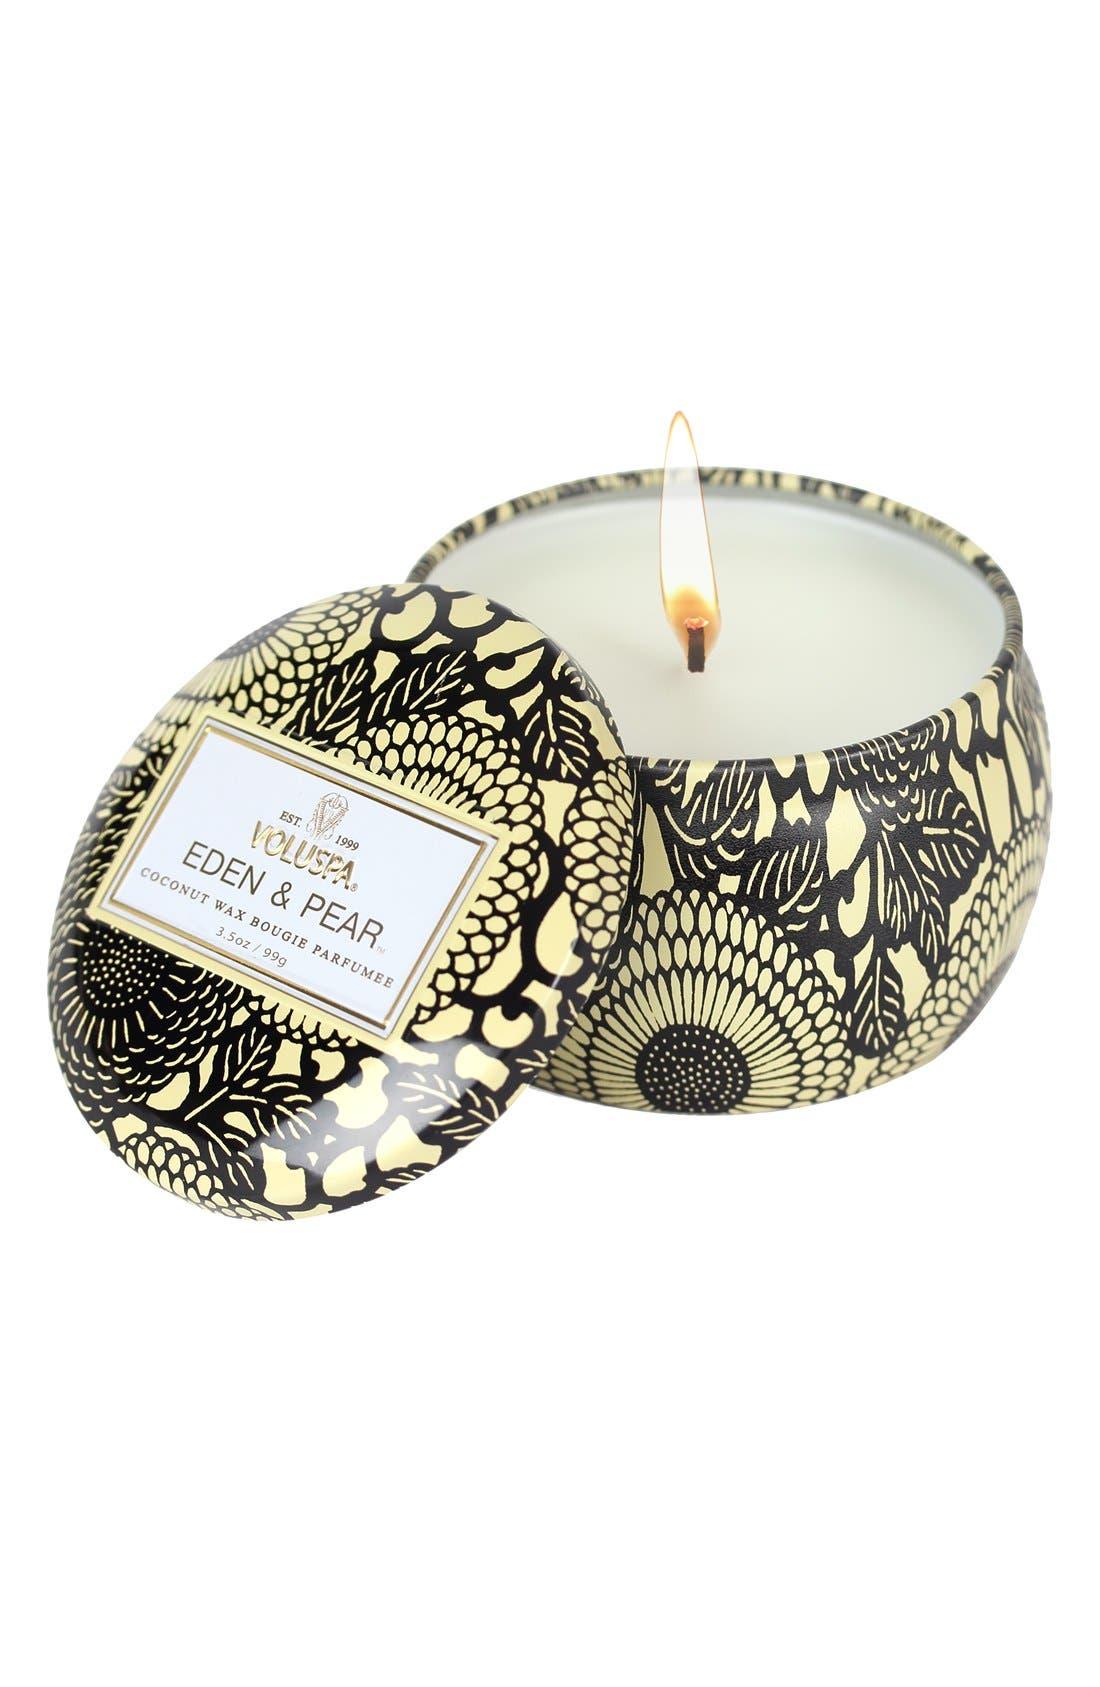 Alternate Image 1 Selected - Voluspa 'Japonica - Eden & Pear' Petite Decorative Candle